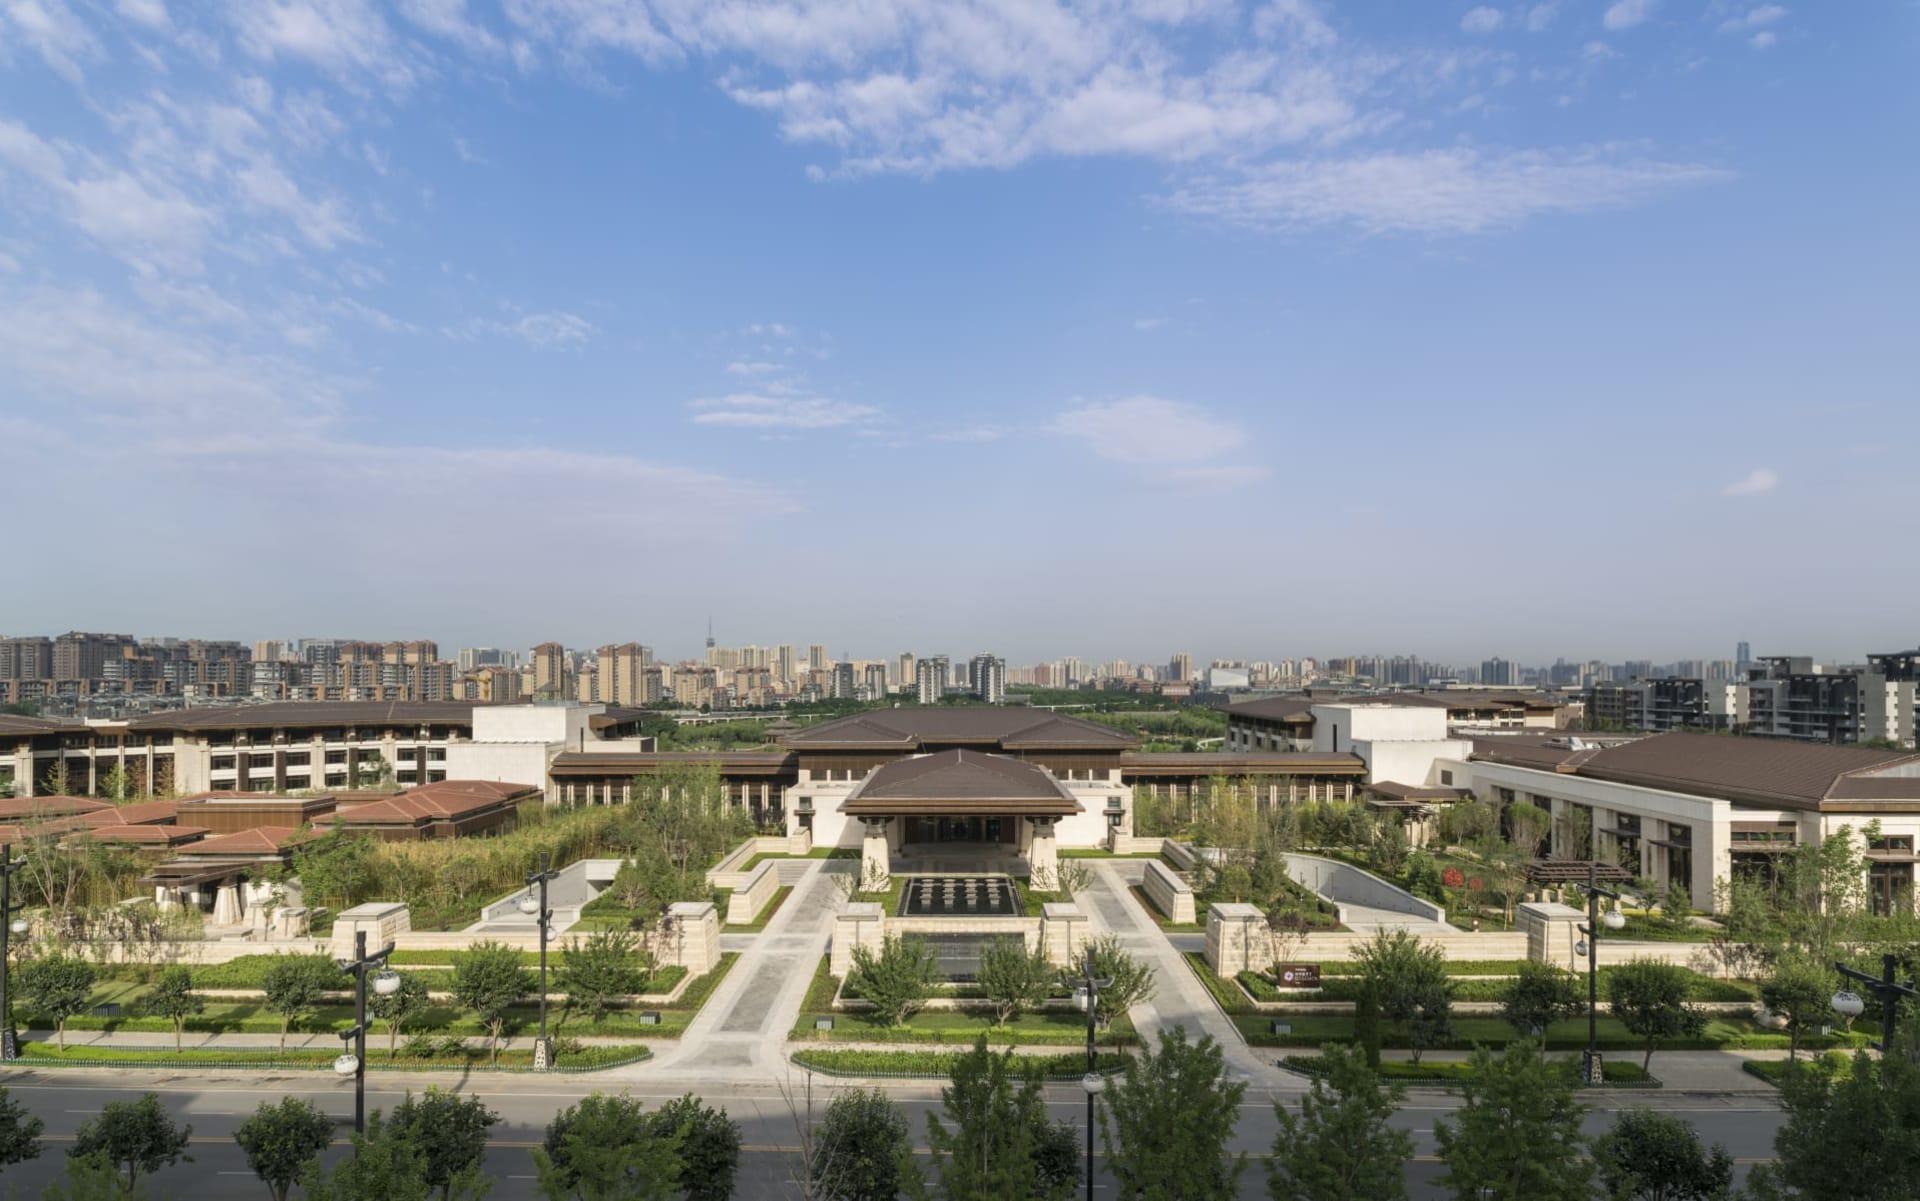 Hyatt Regency in Xian: Hotel Exterior Day Shot